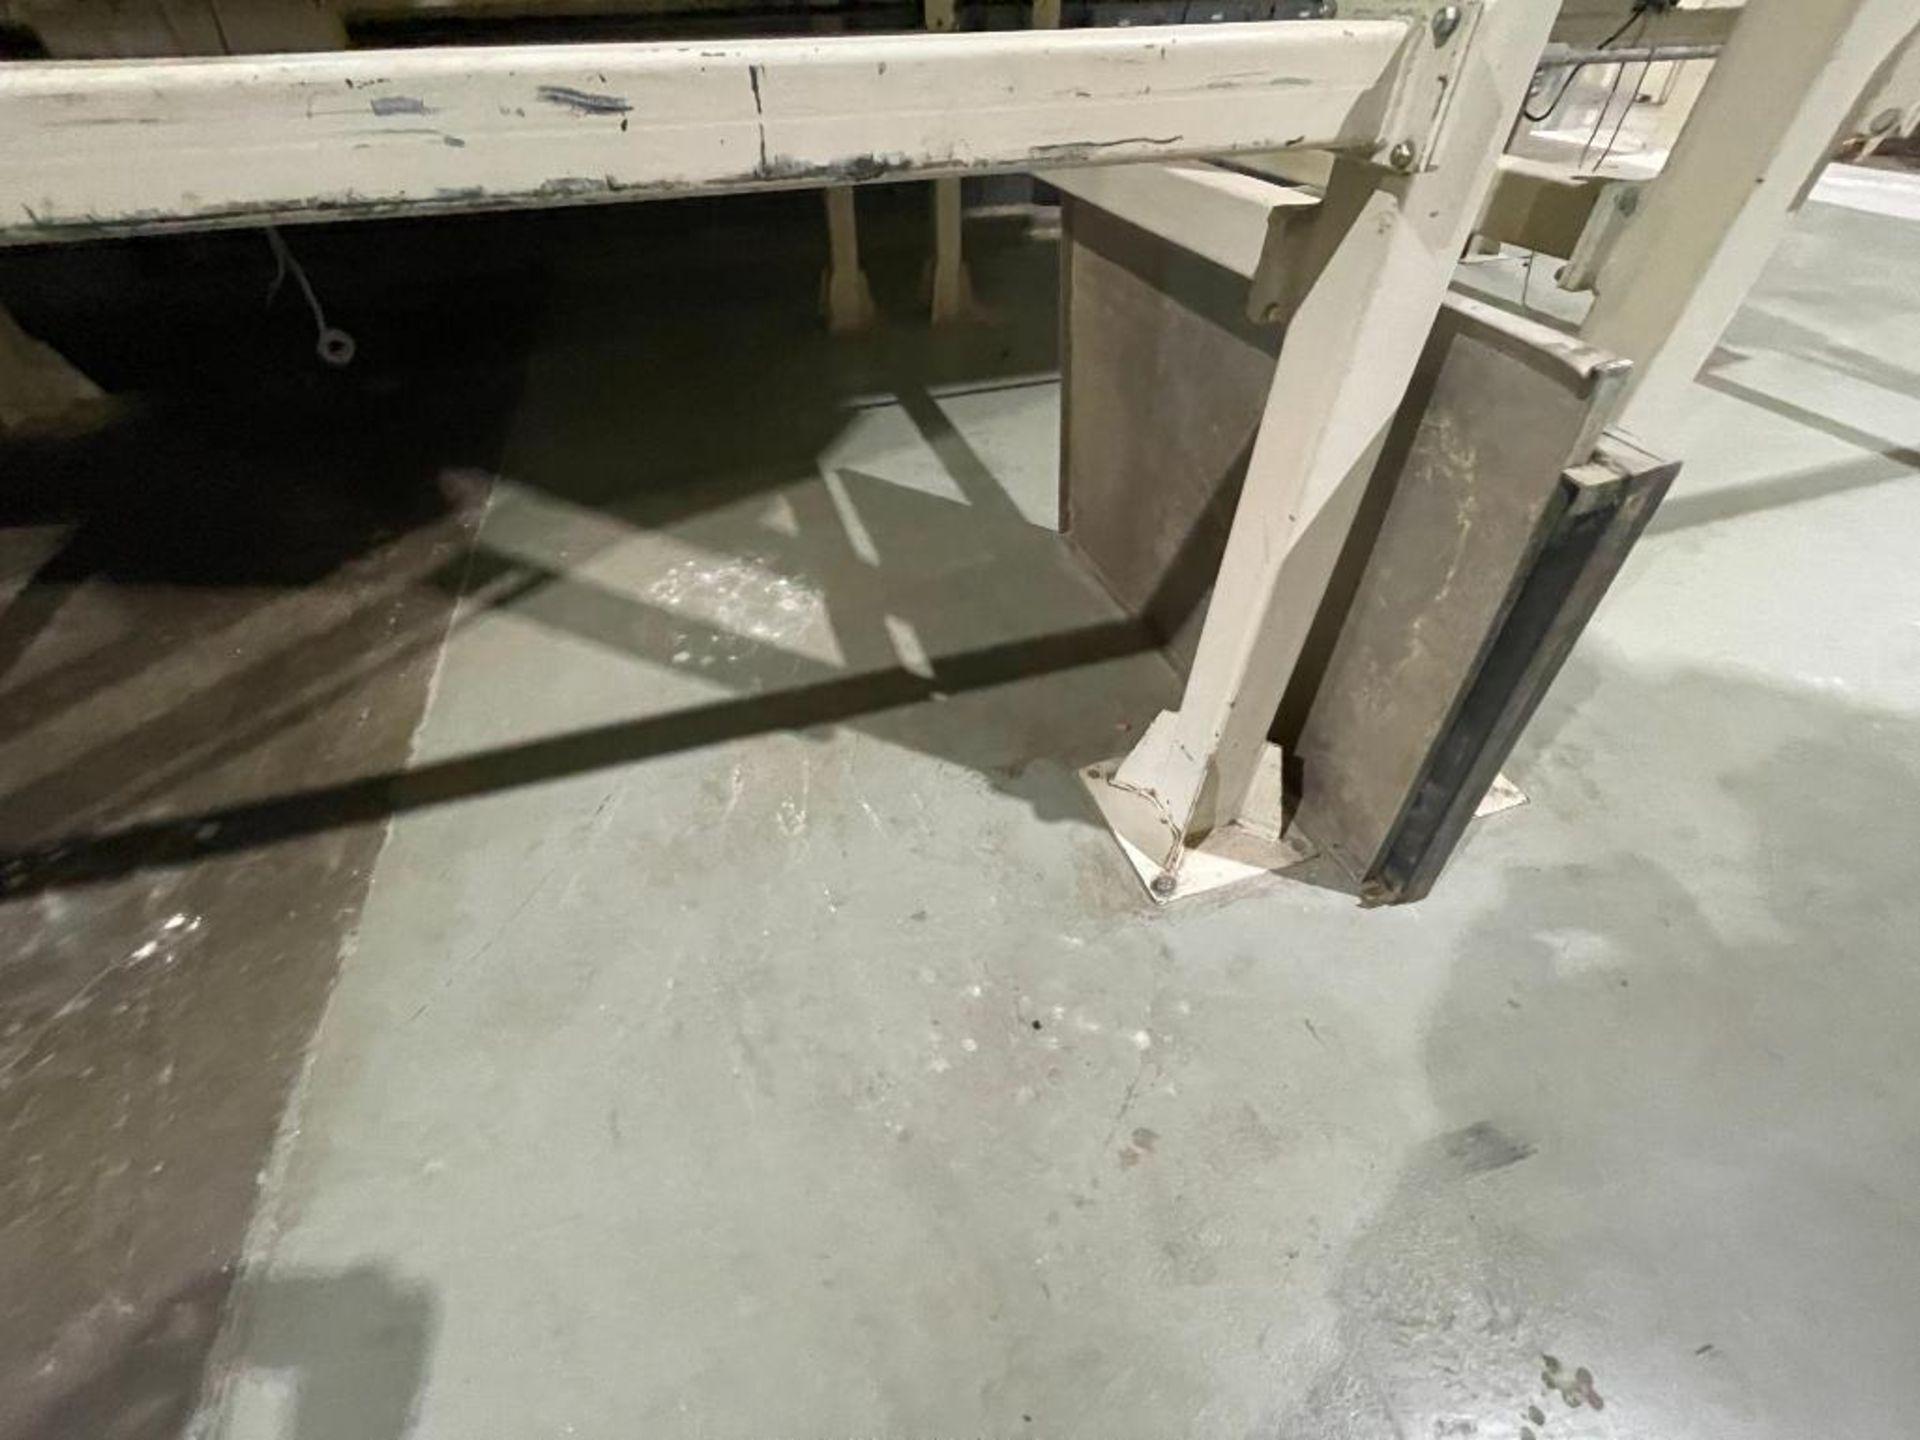 Aseeco mild steel cone bottom bulk storage bin - Image 6 of 31